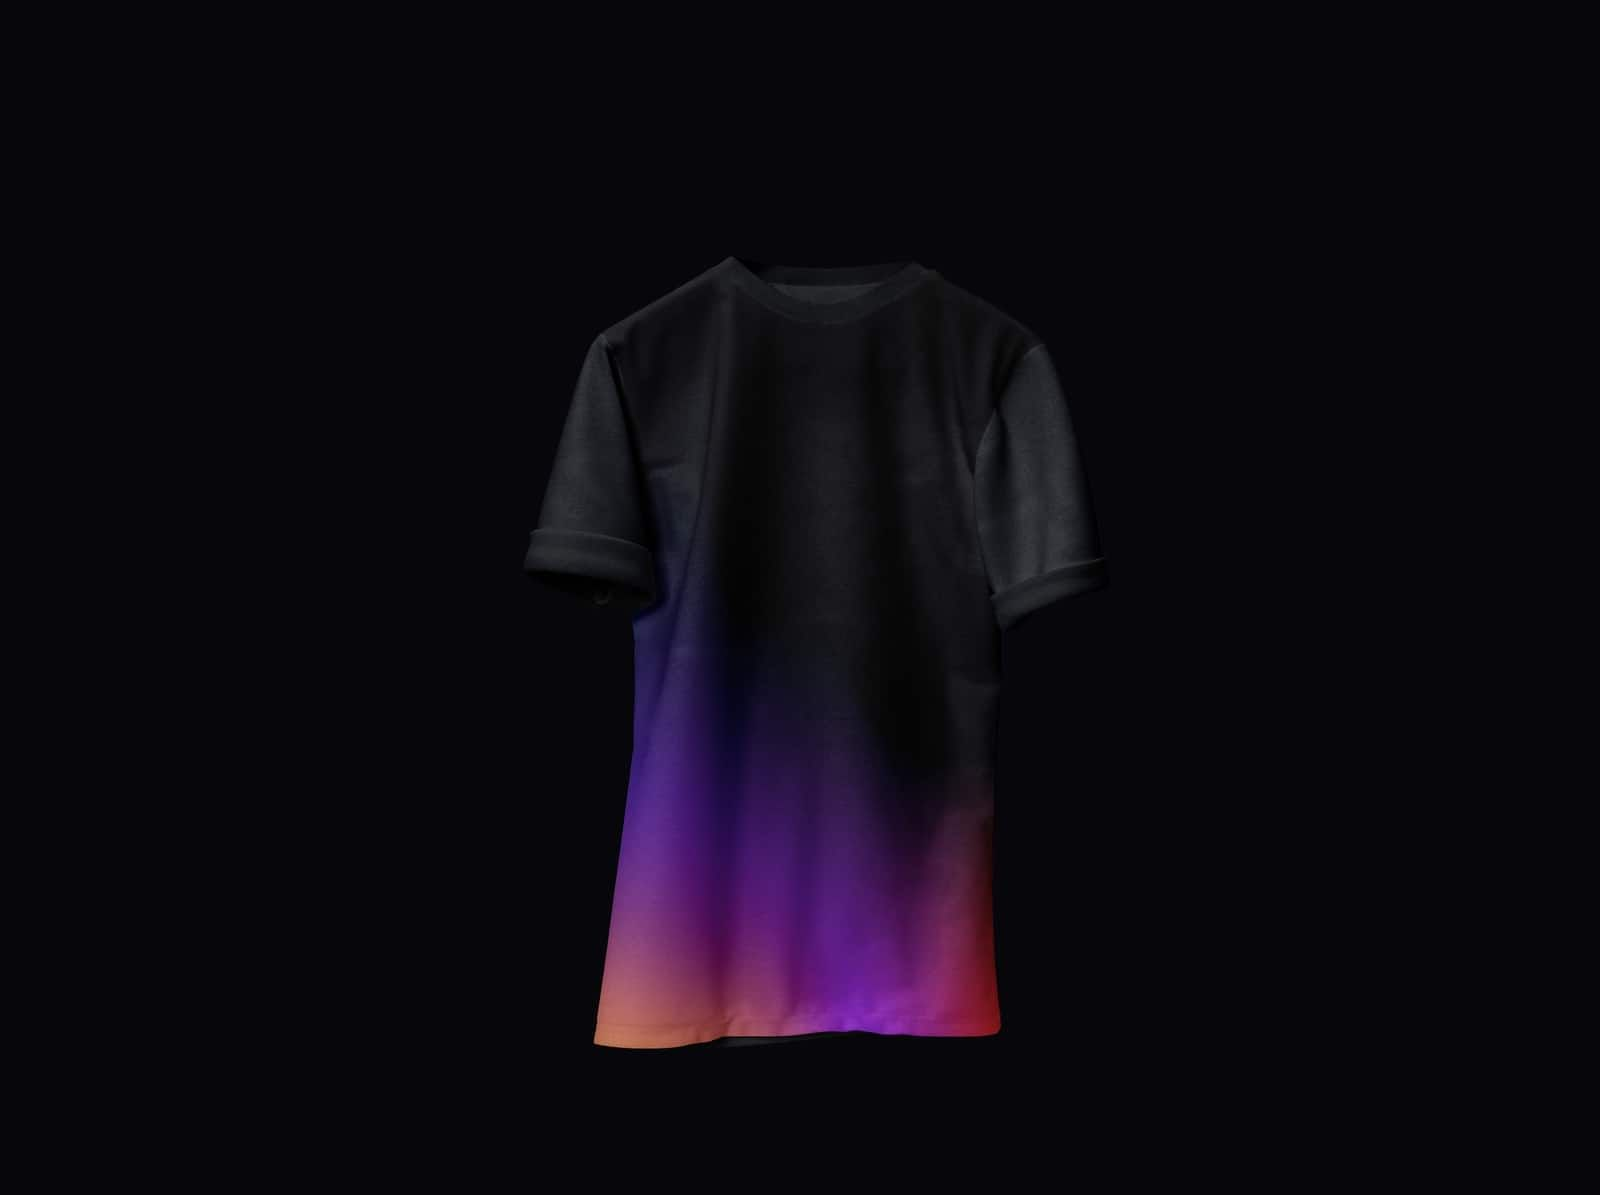 Download Creative Man S T Shirt Free Mockup Shirt Mockup Free Shirts Tshirt Mockup